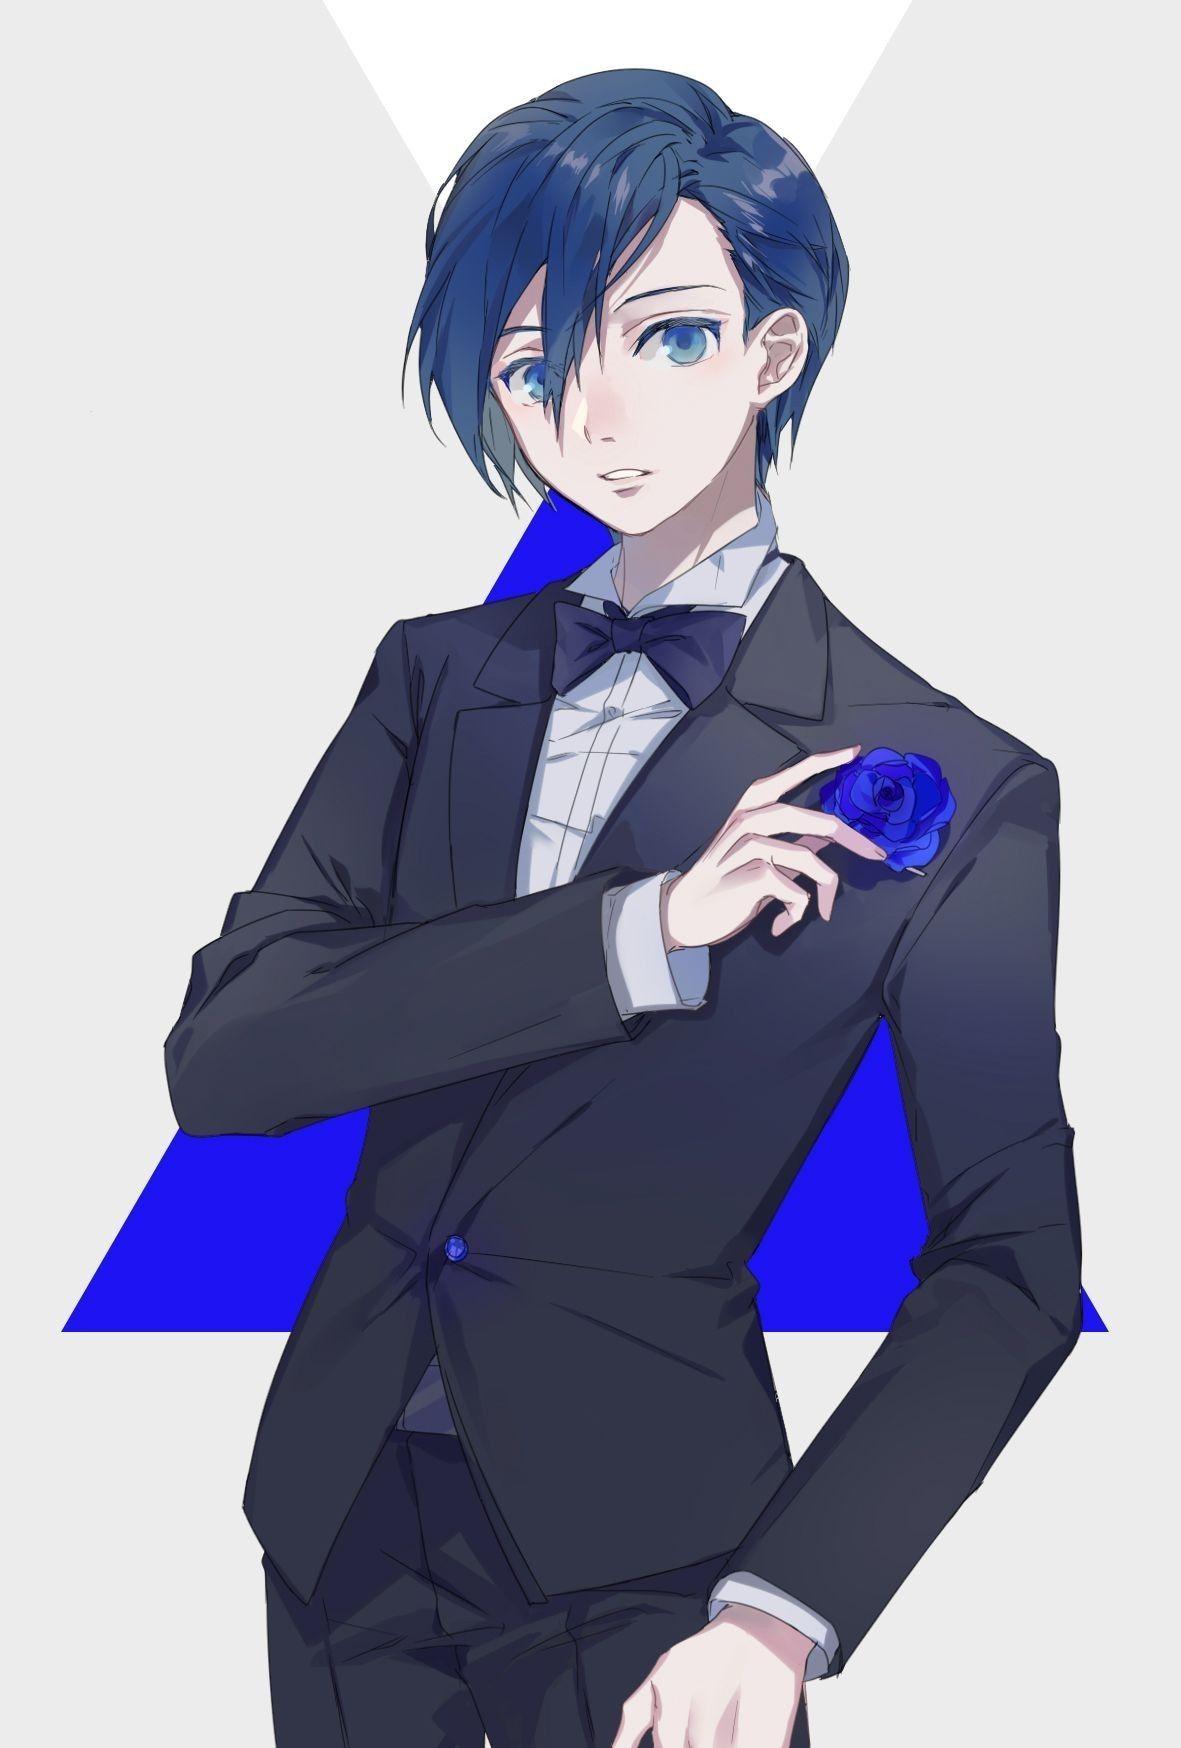 Beautiful Anime Boy Art Handsome Drawing Fashion